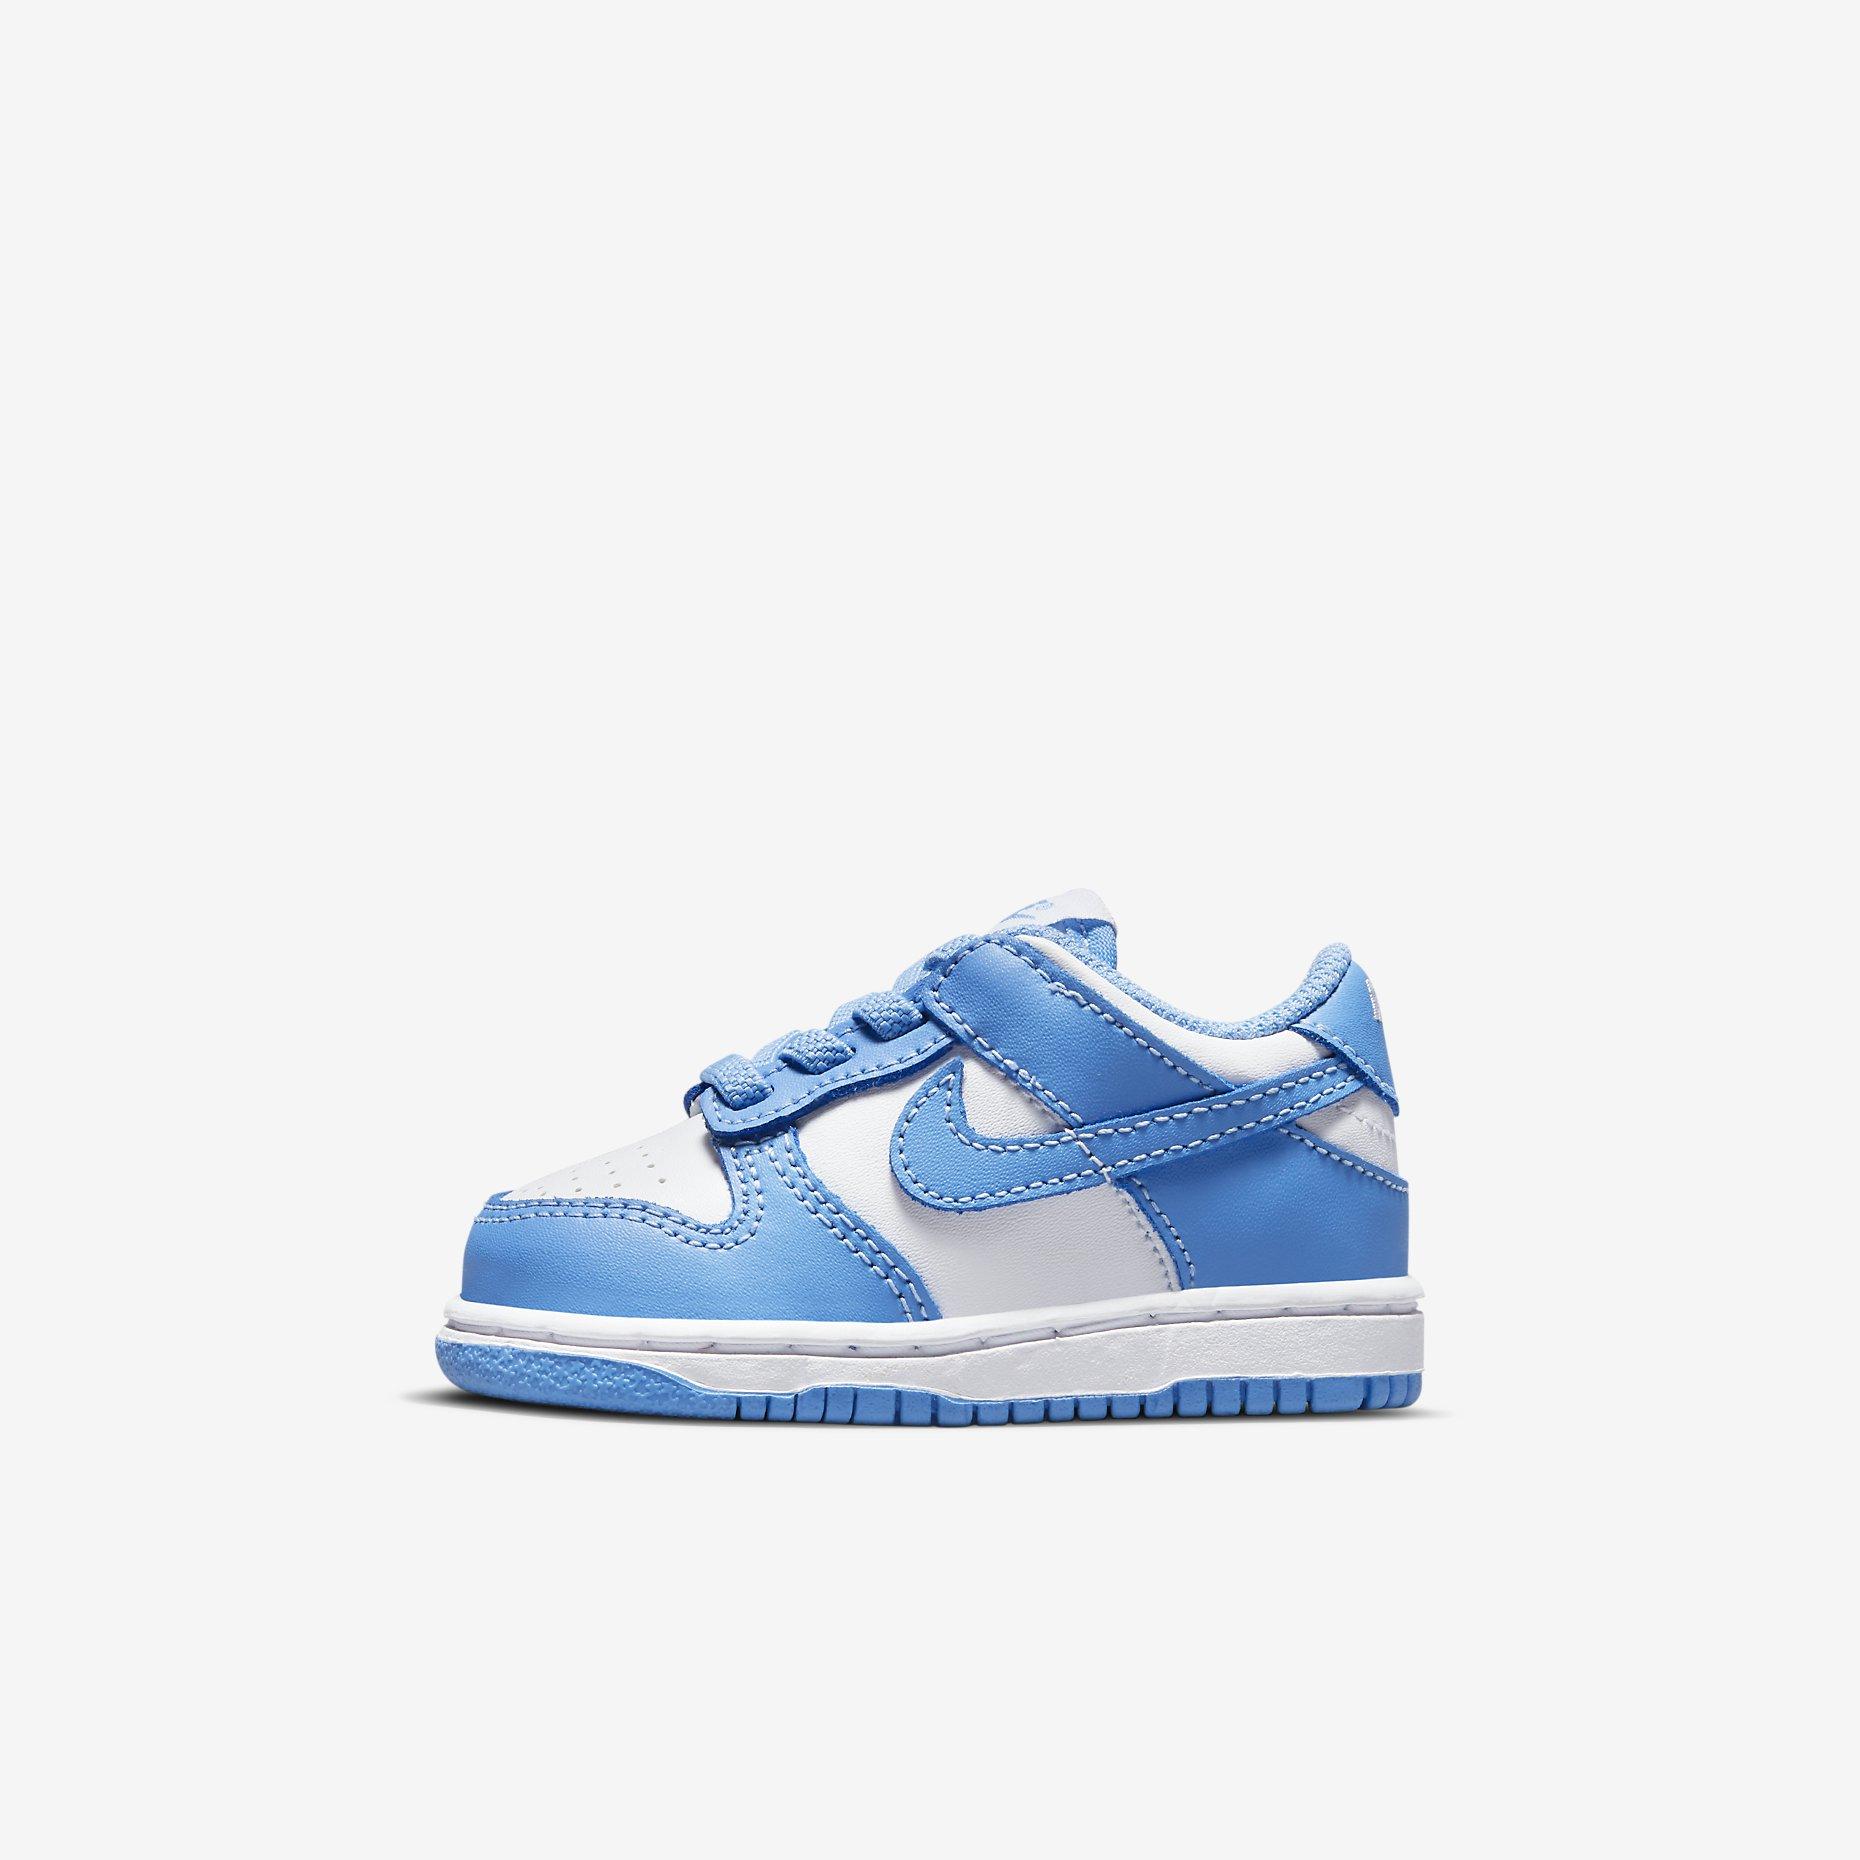 Nike Dunk Low TD 'University Blue'}